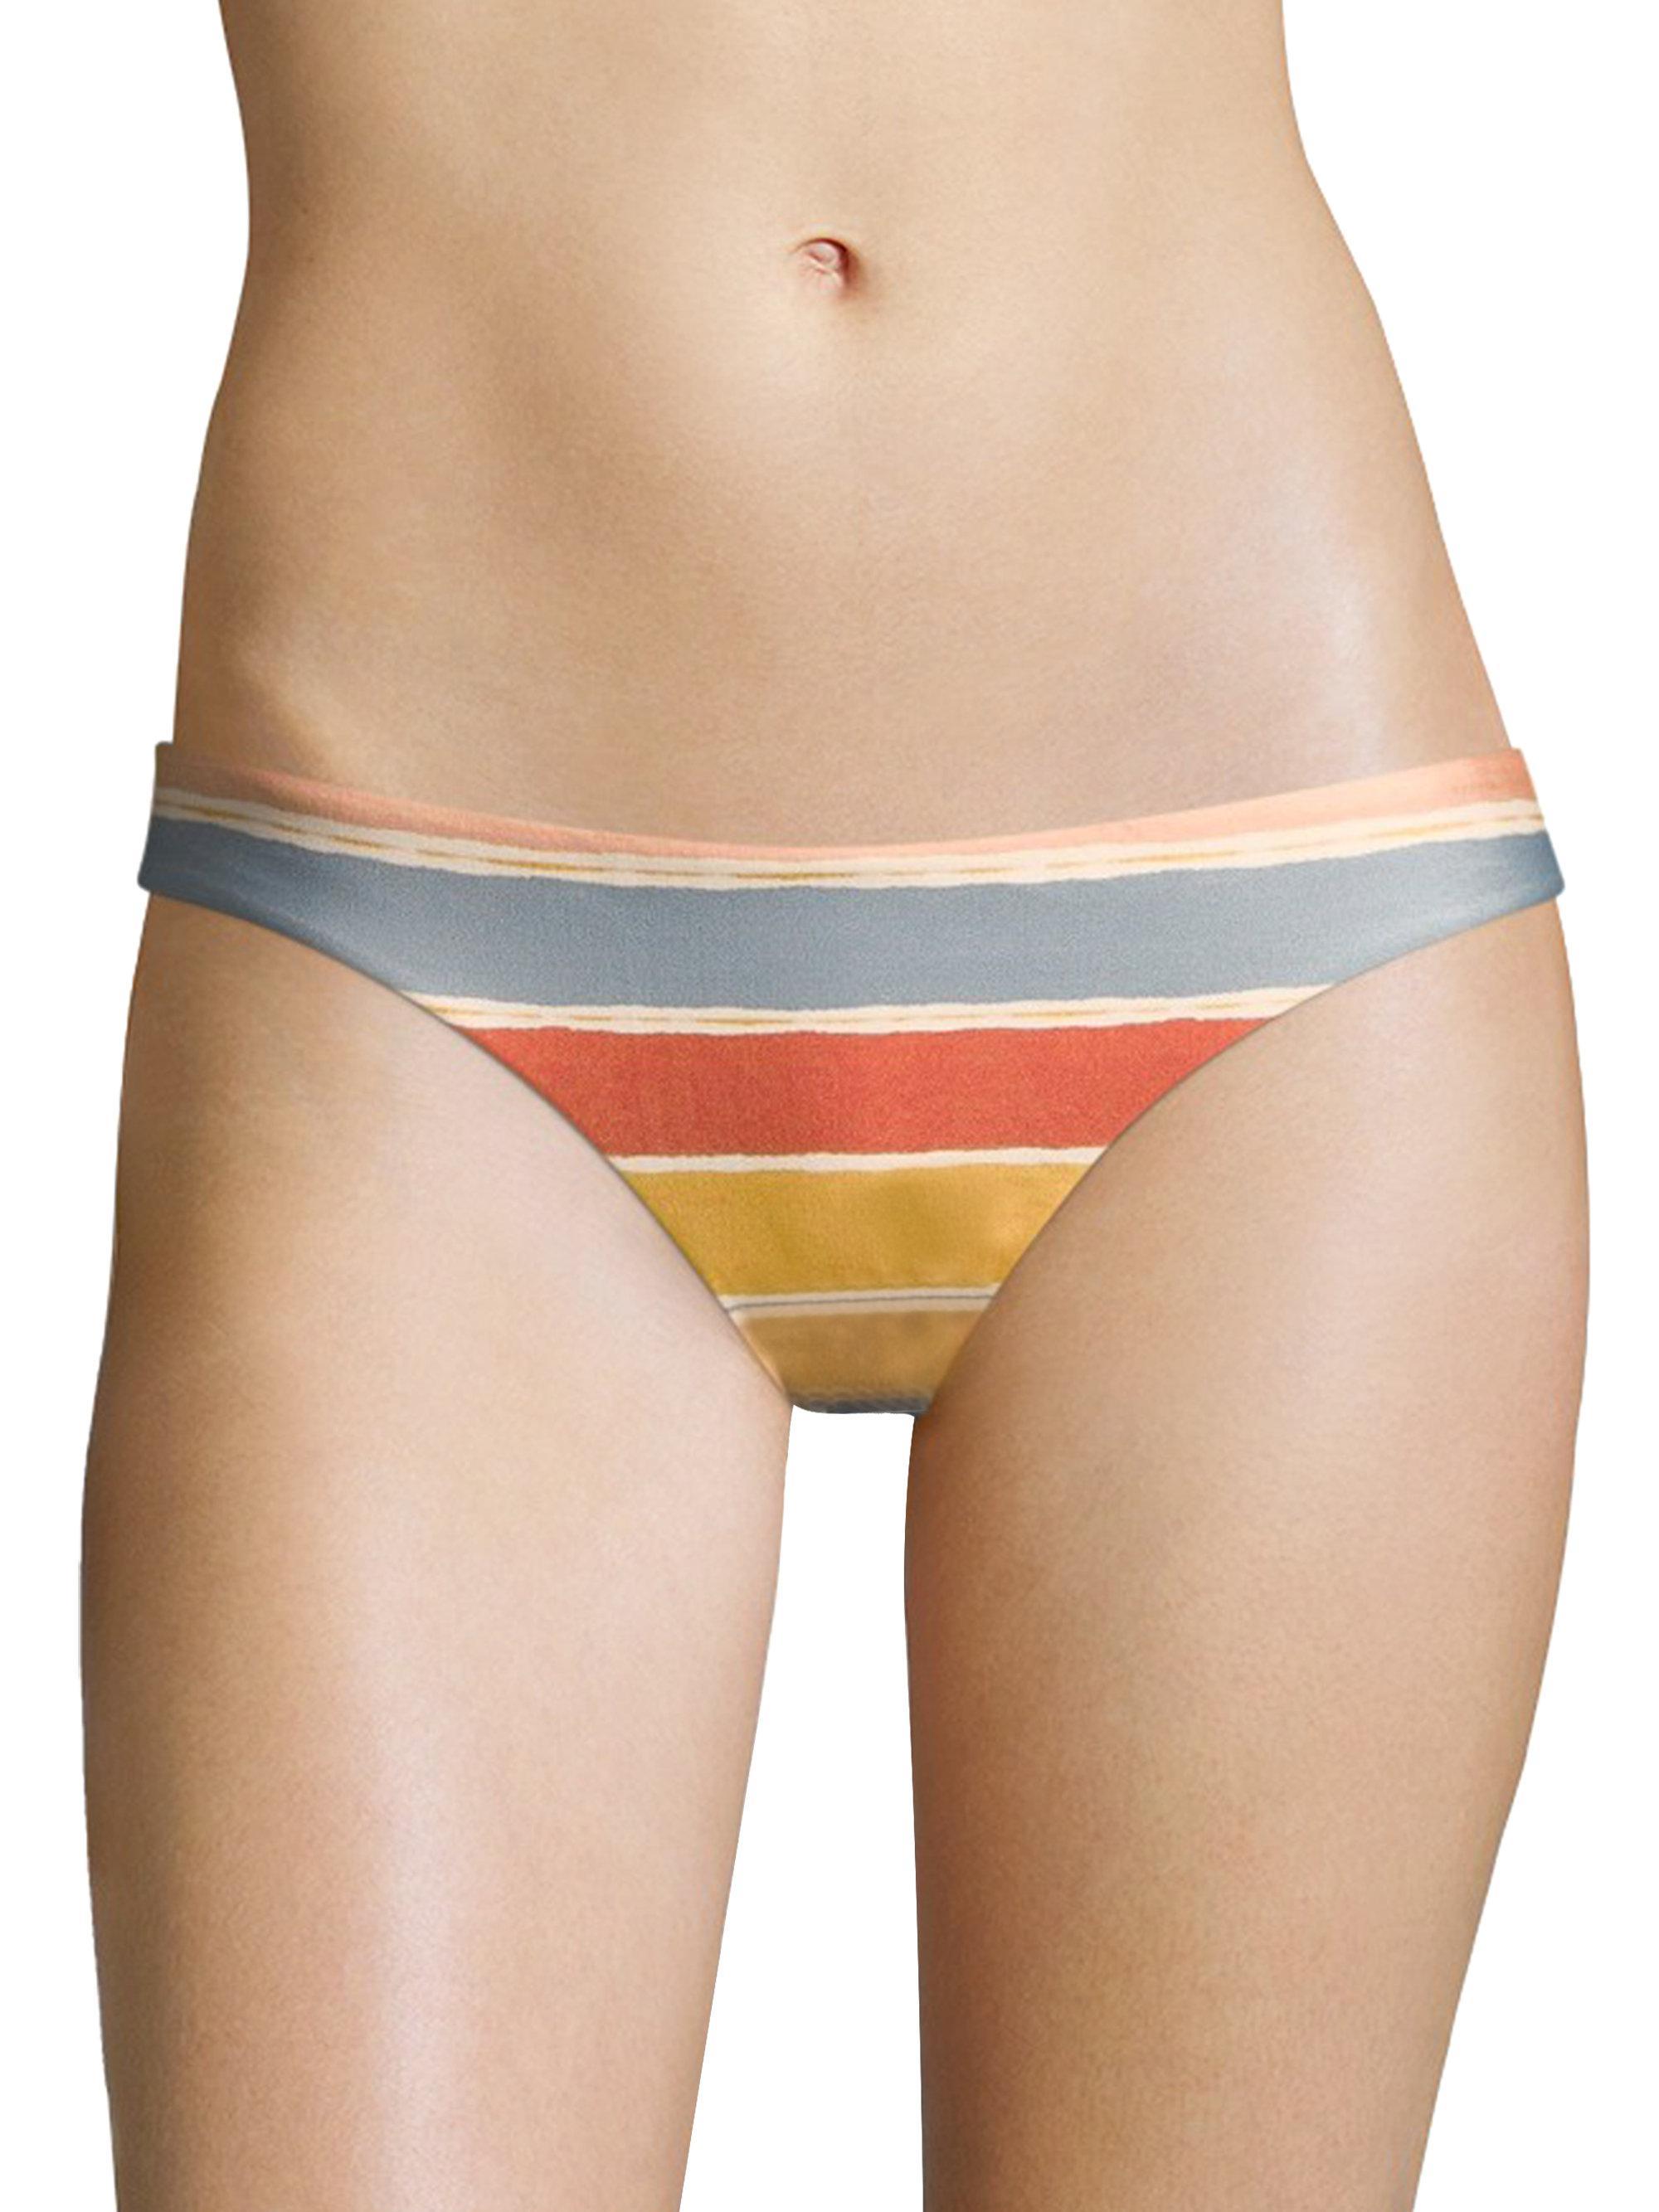 ViX. Women's Vix X Paula Hermanny Guadalupe Basic Bikini Bottom